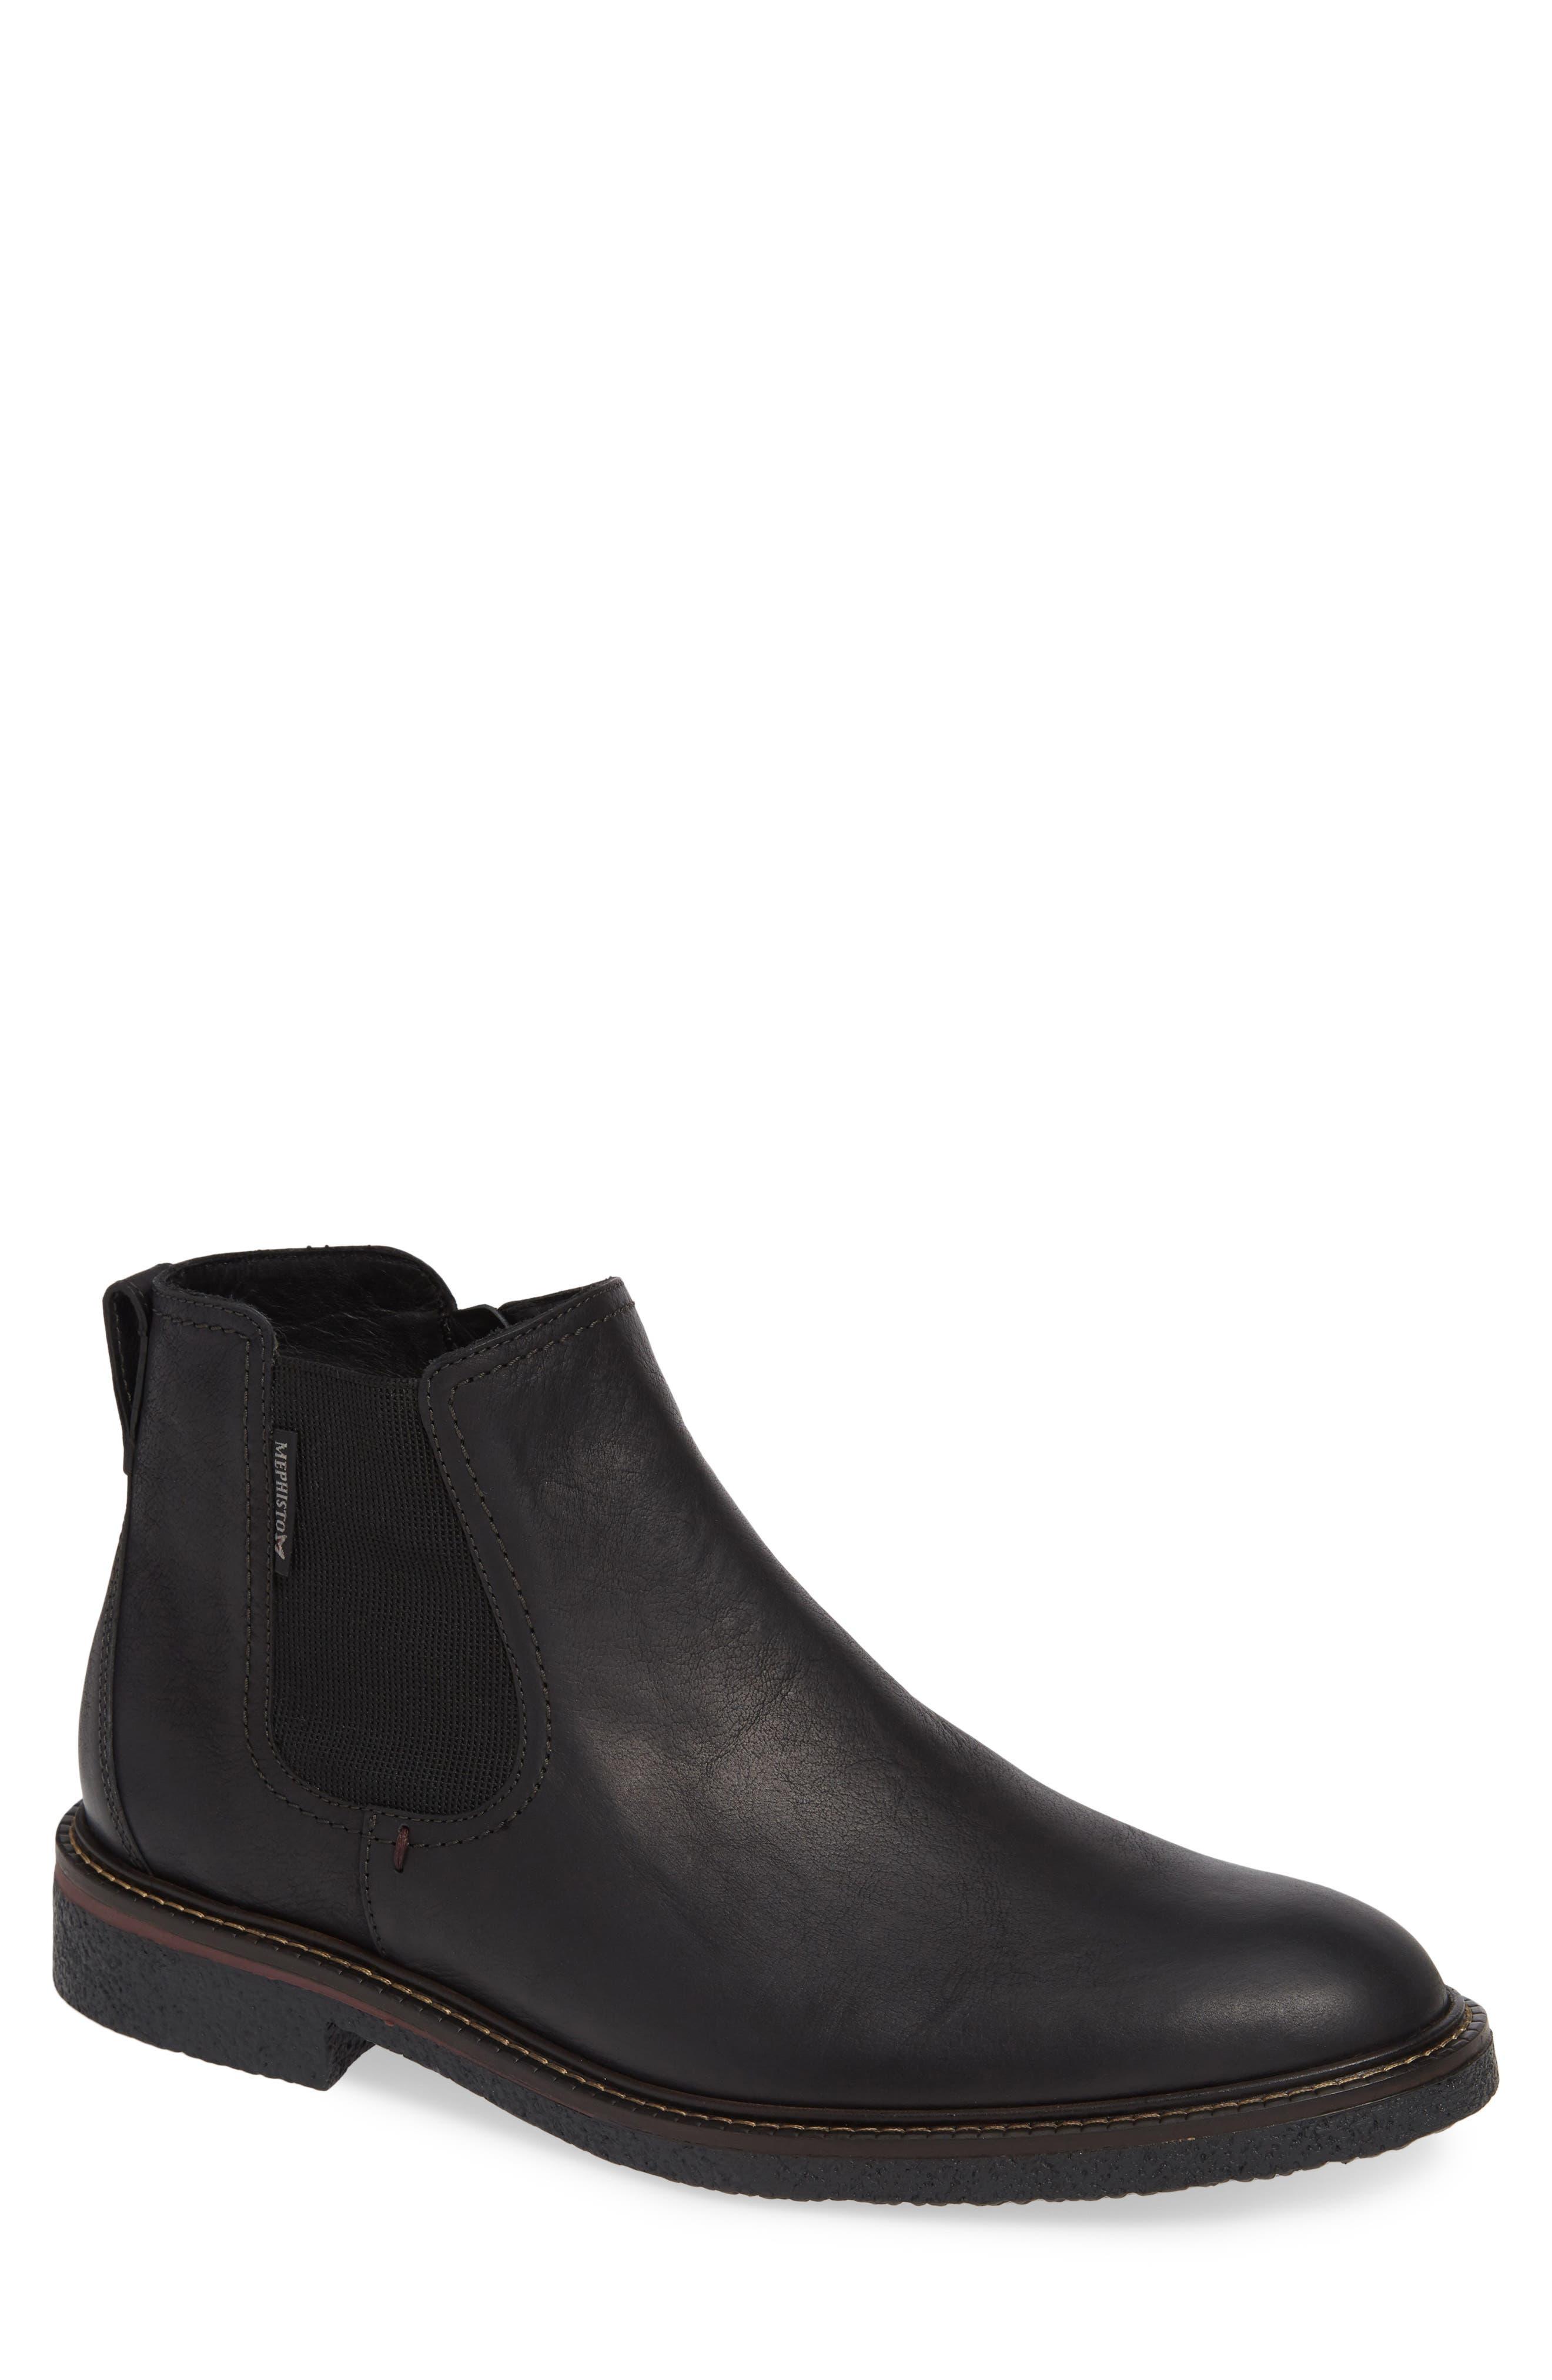 Guillem Mid Chelsea Boot,                         Main,                         color, 001